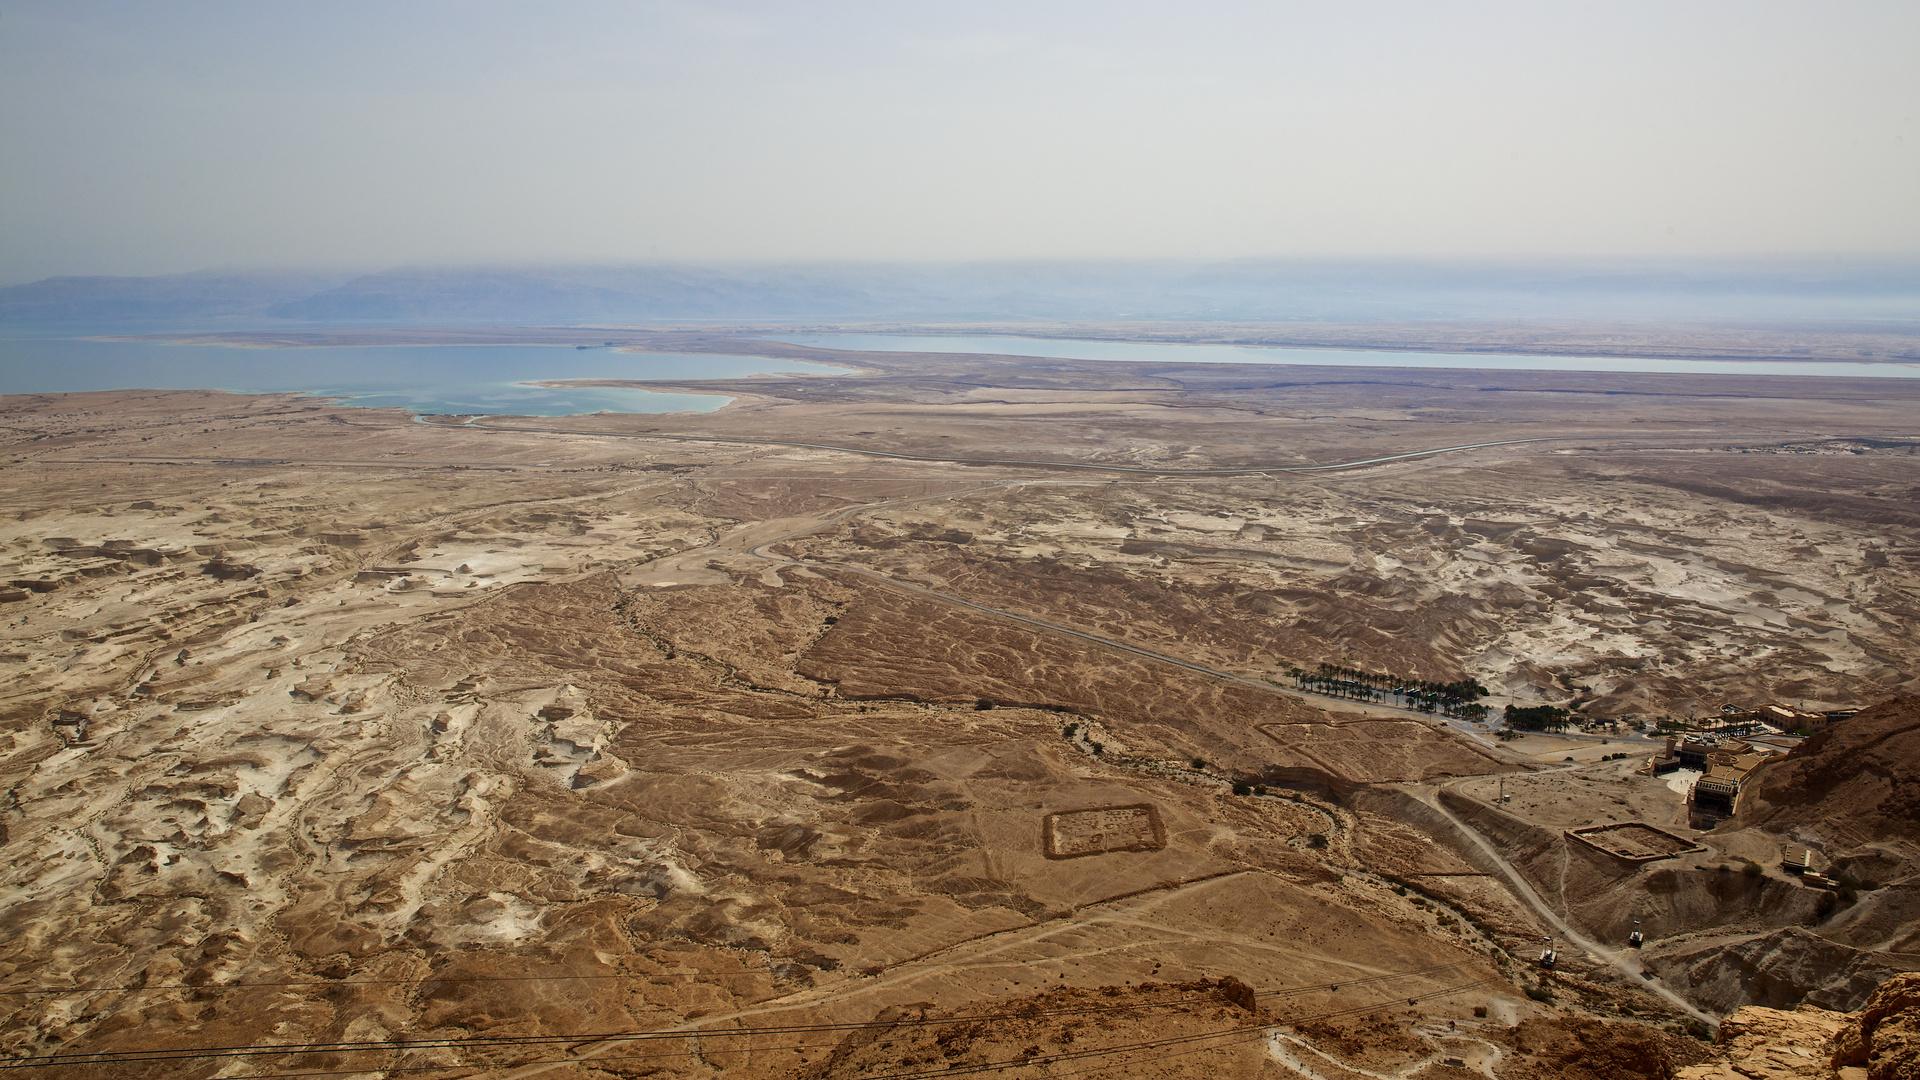 Wadi Masada